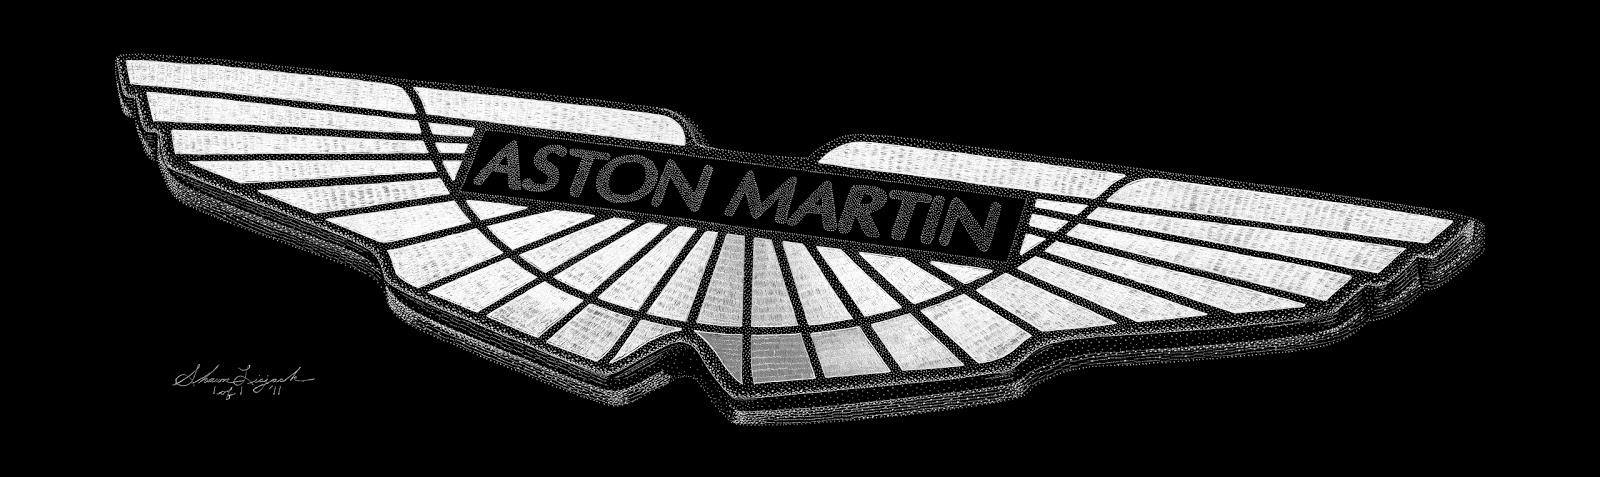 Aston Martin Logo >> Exotic Engravings: Aston Martin Logo